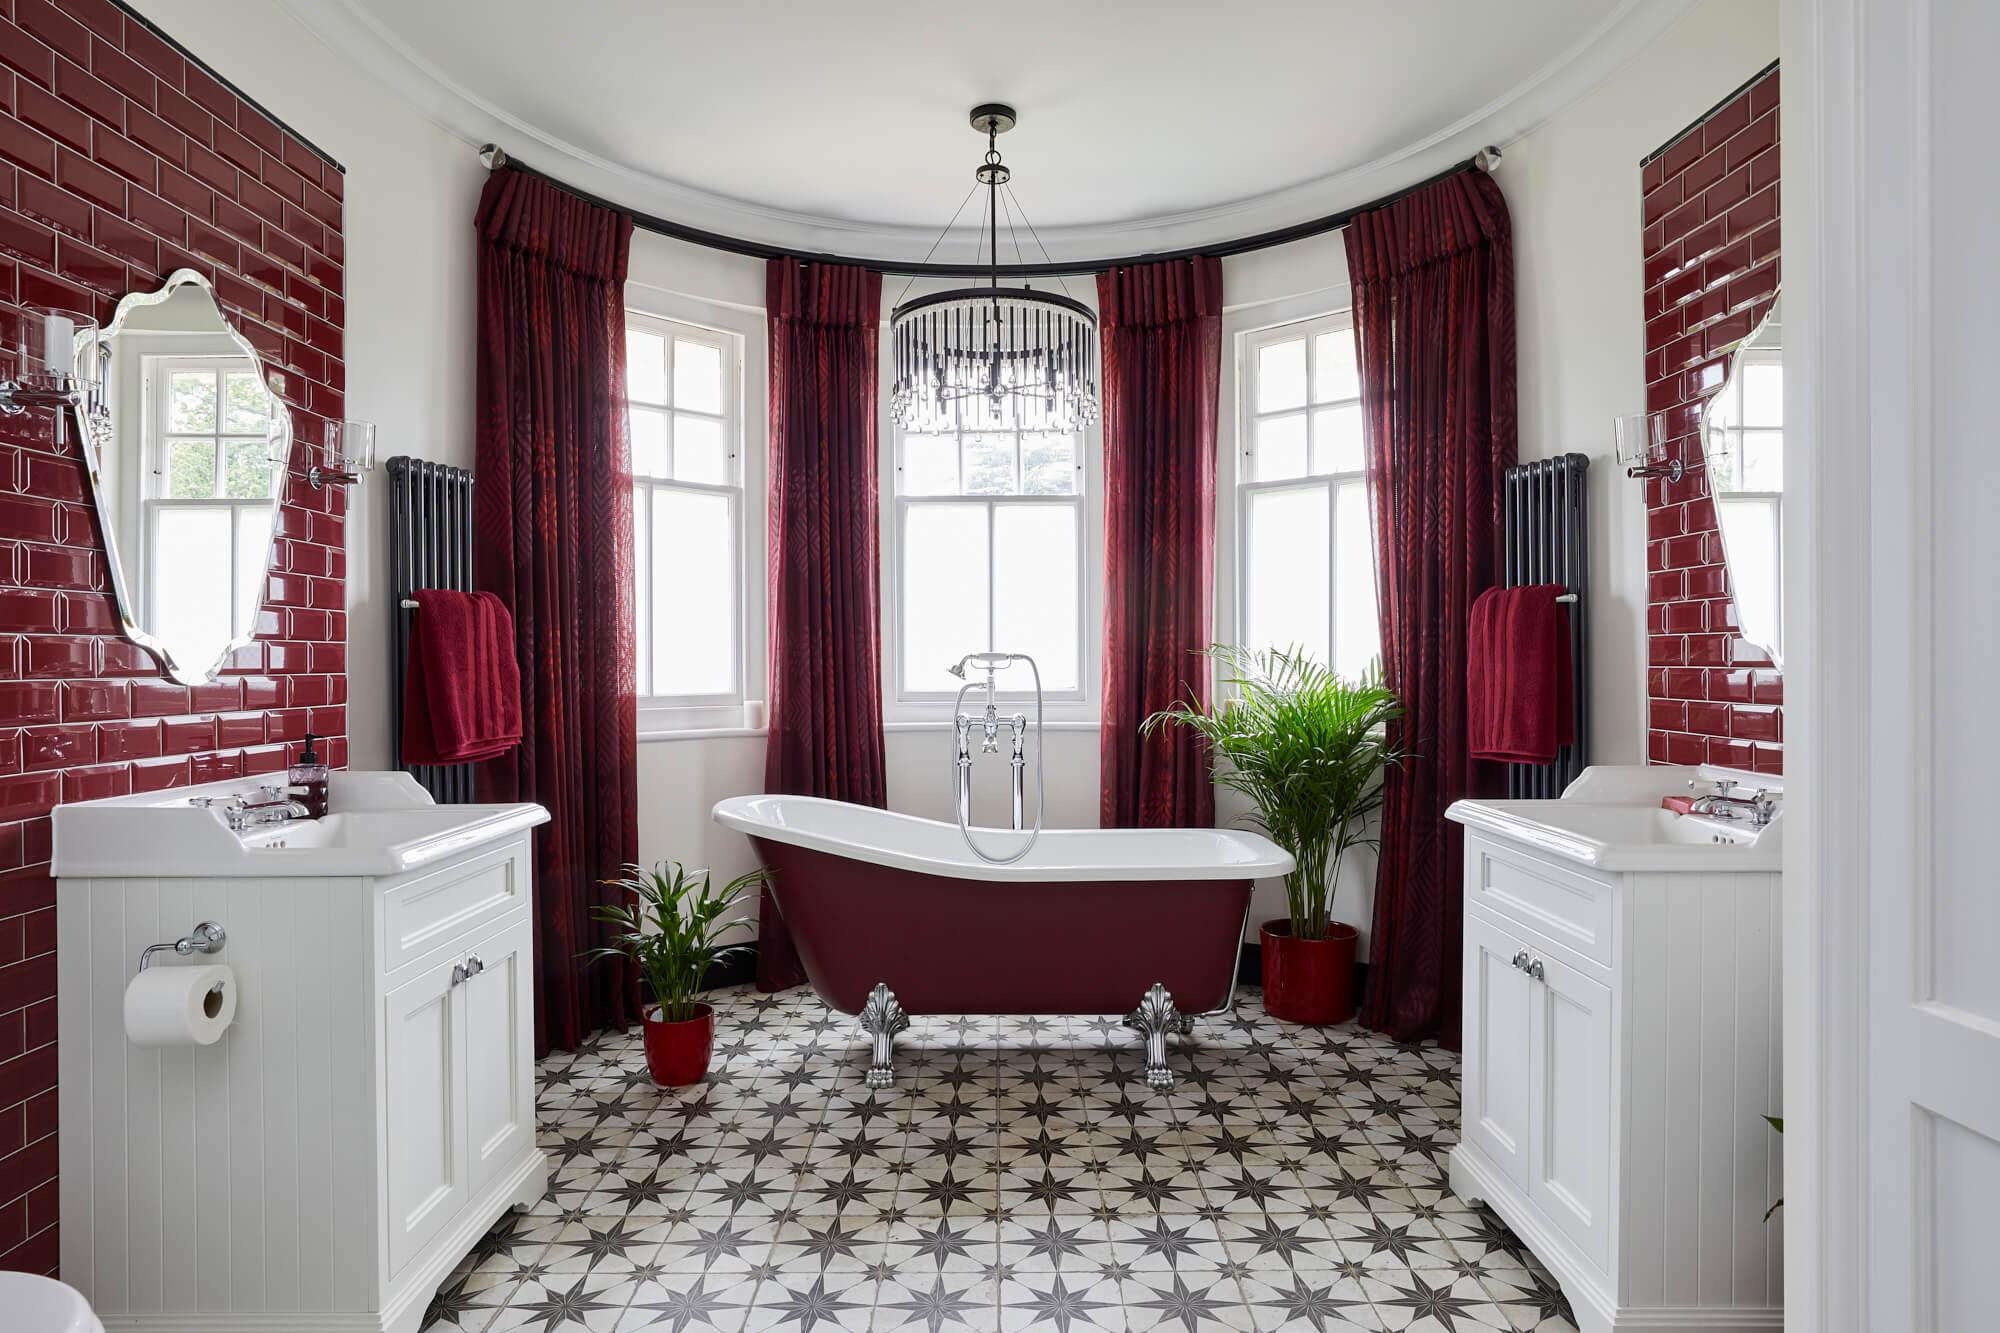 Bathroom Eleven - statement master Ensuite in Surbiton